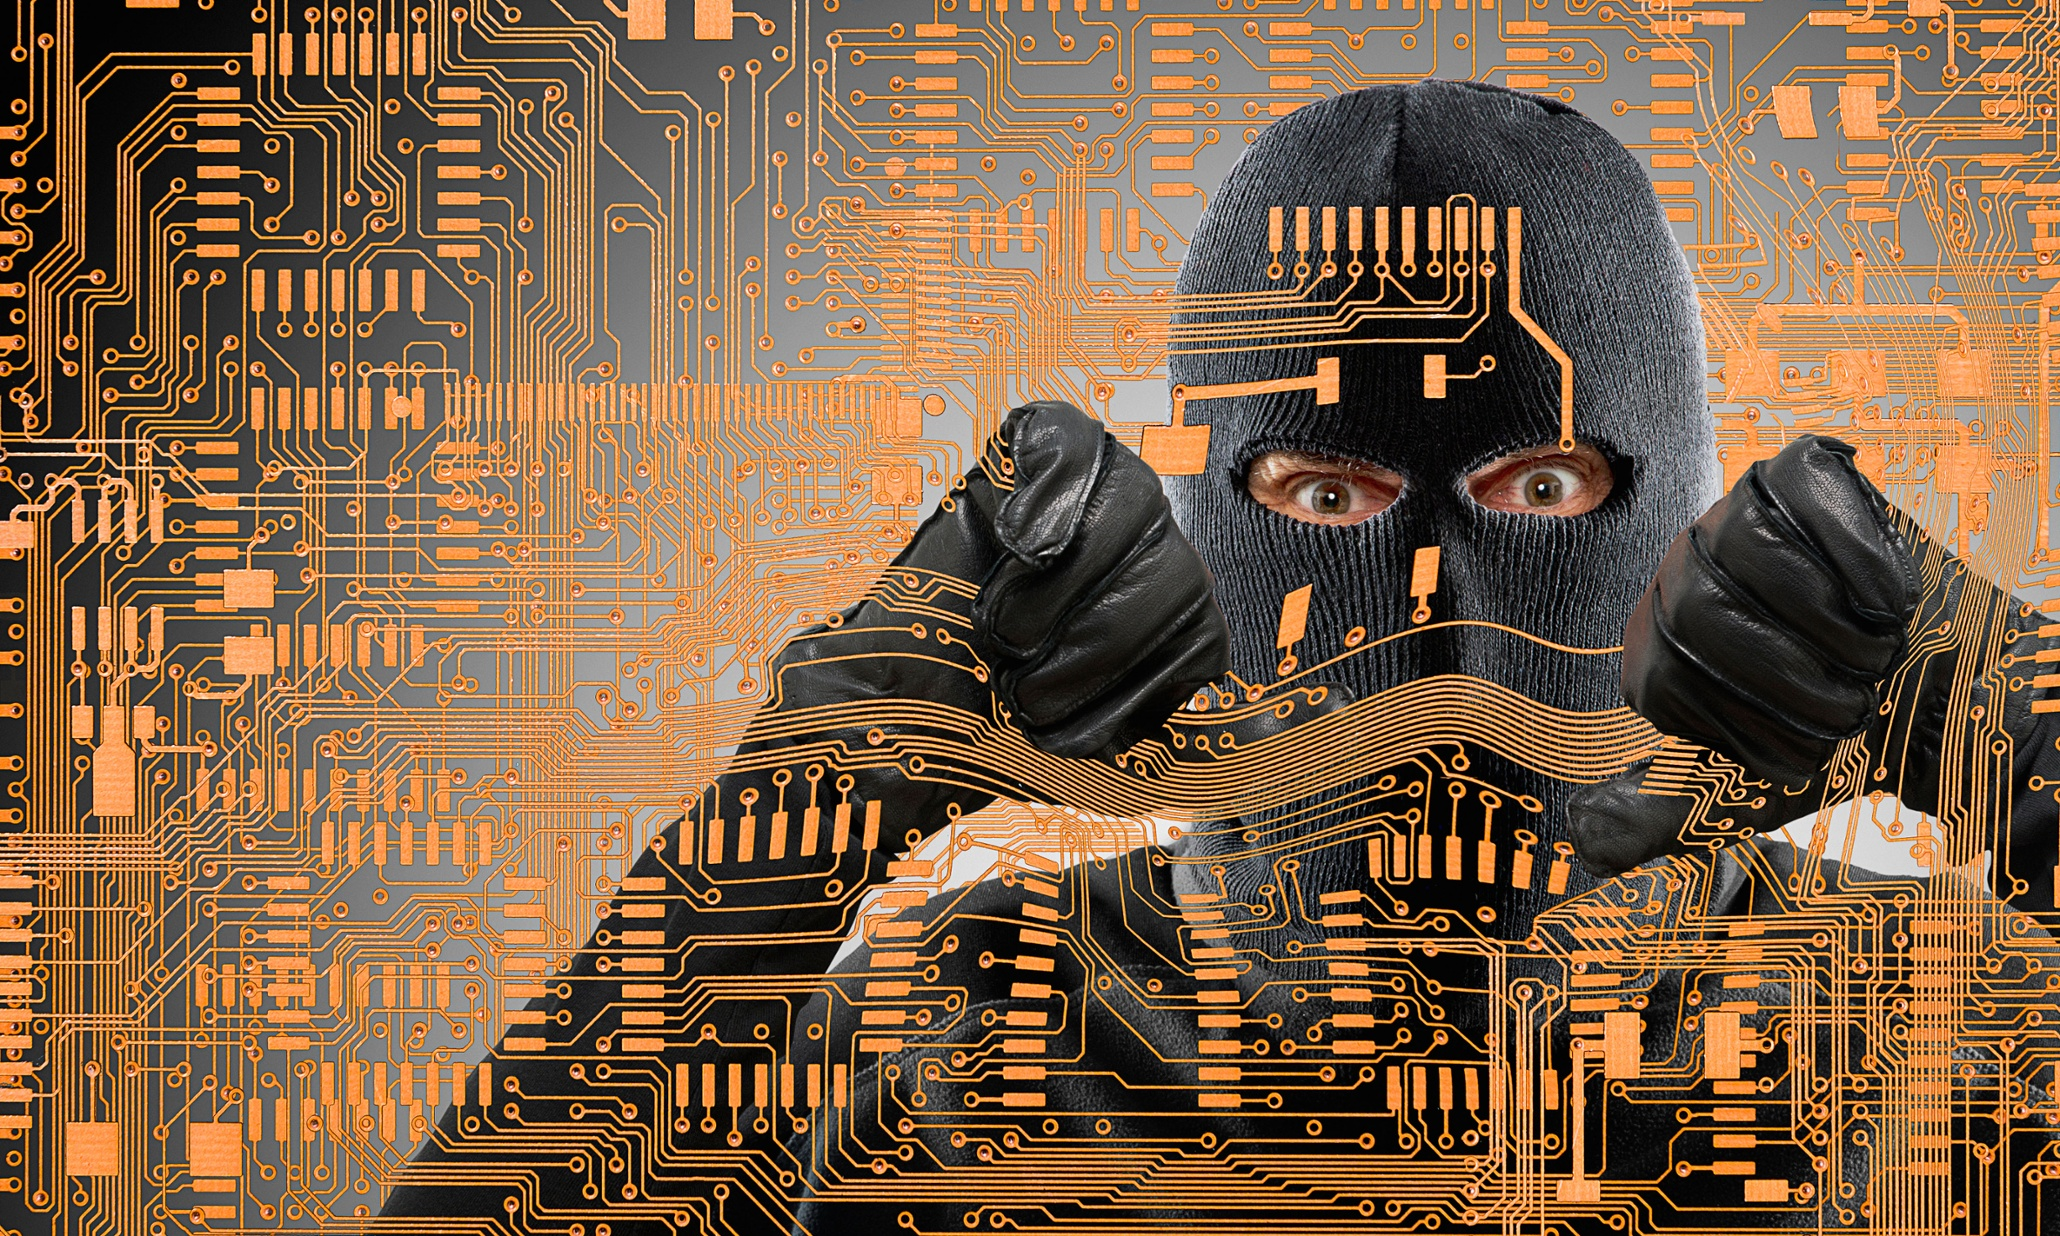 Should we hack the hackers?